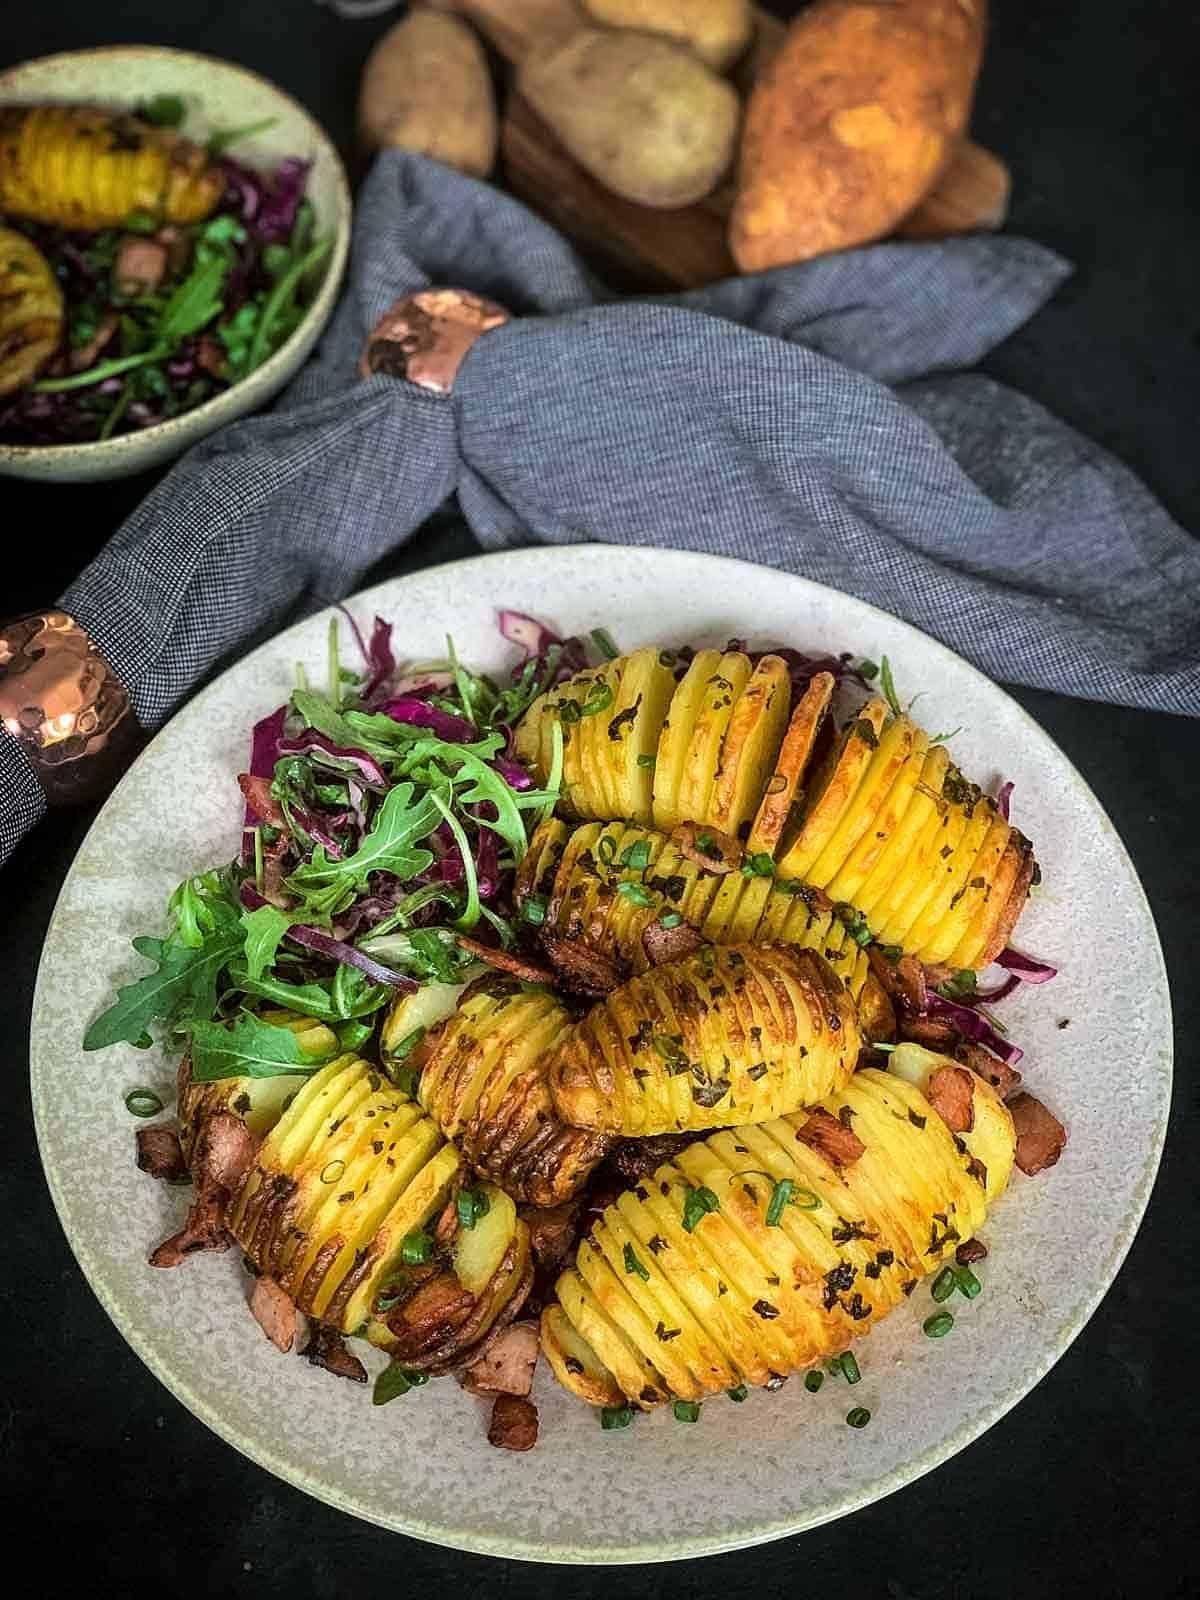 Salad with Roasted Potatoes, Bacon & Arugula